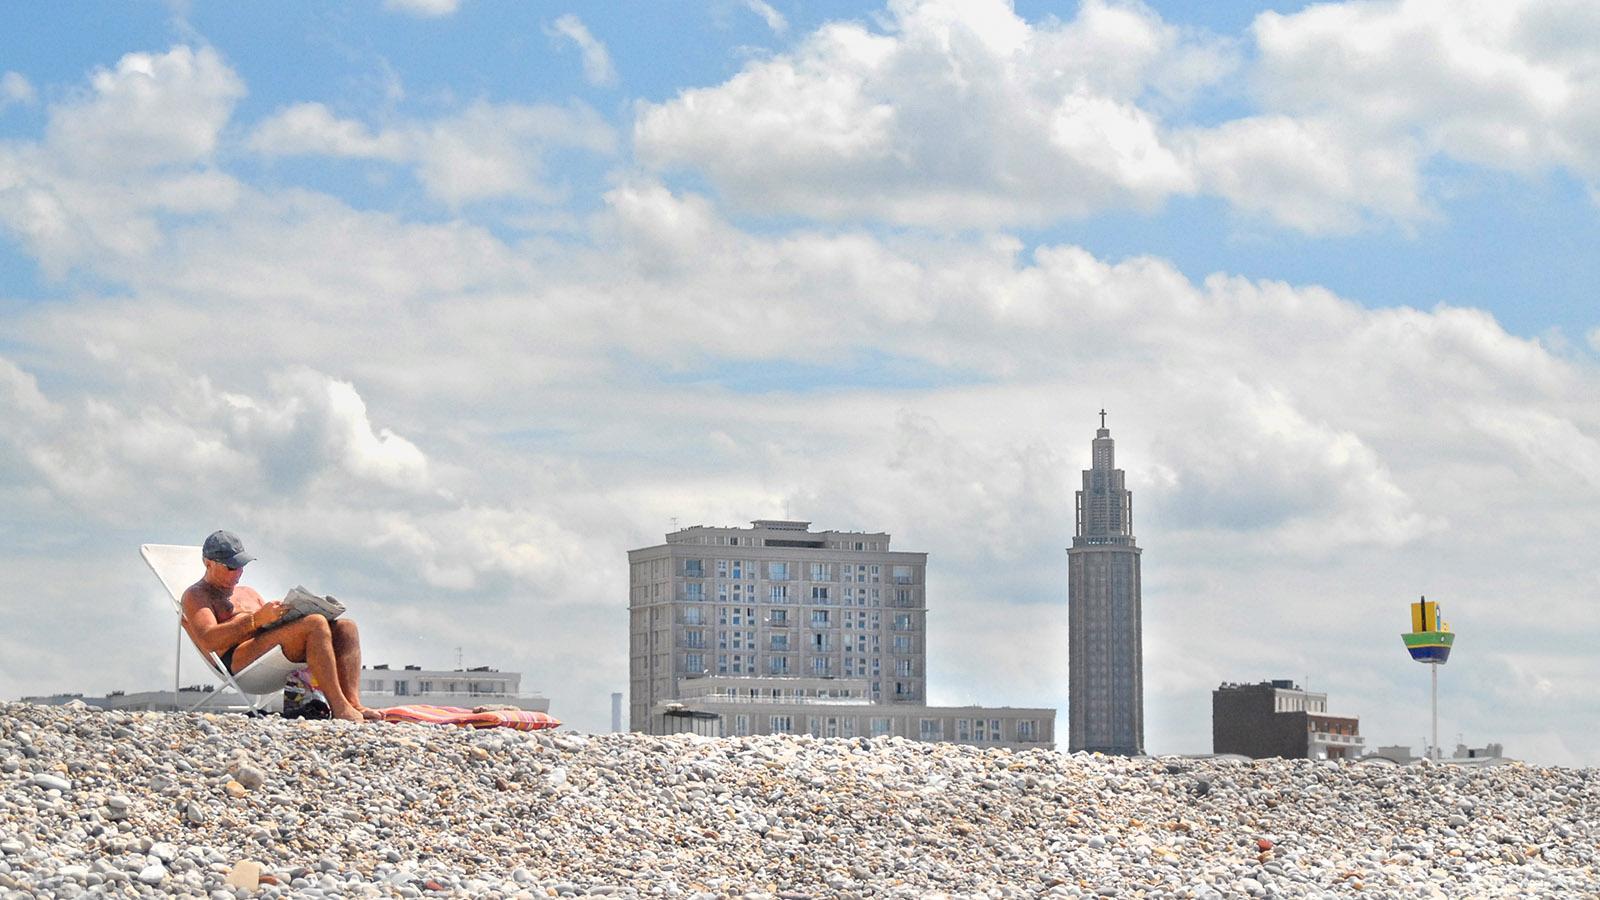 Le Havre: der Kiesstrand mit der Skyline. Foto: Hilke Maunder